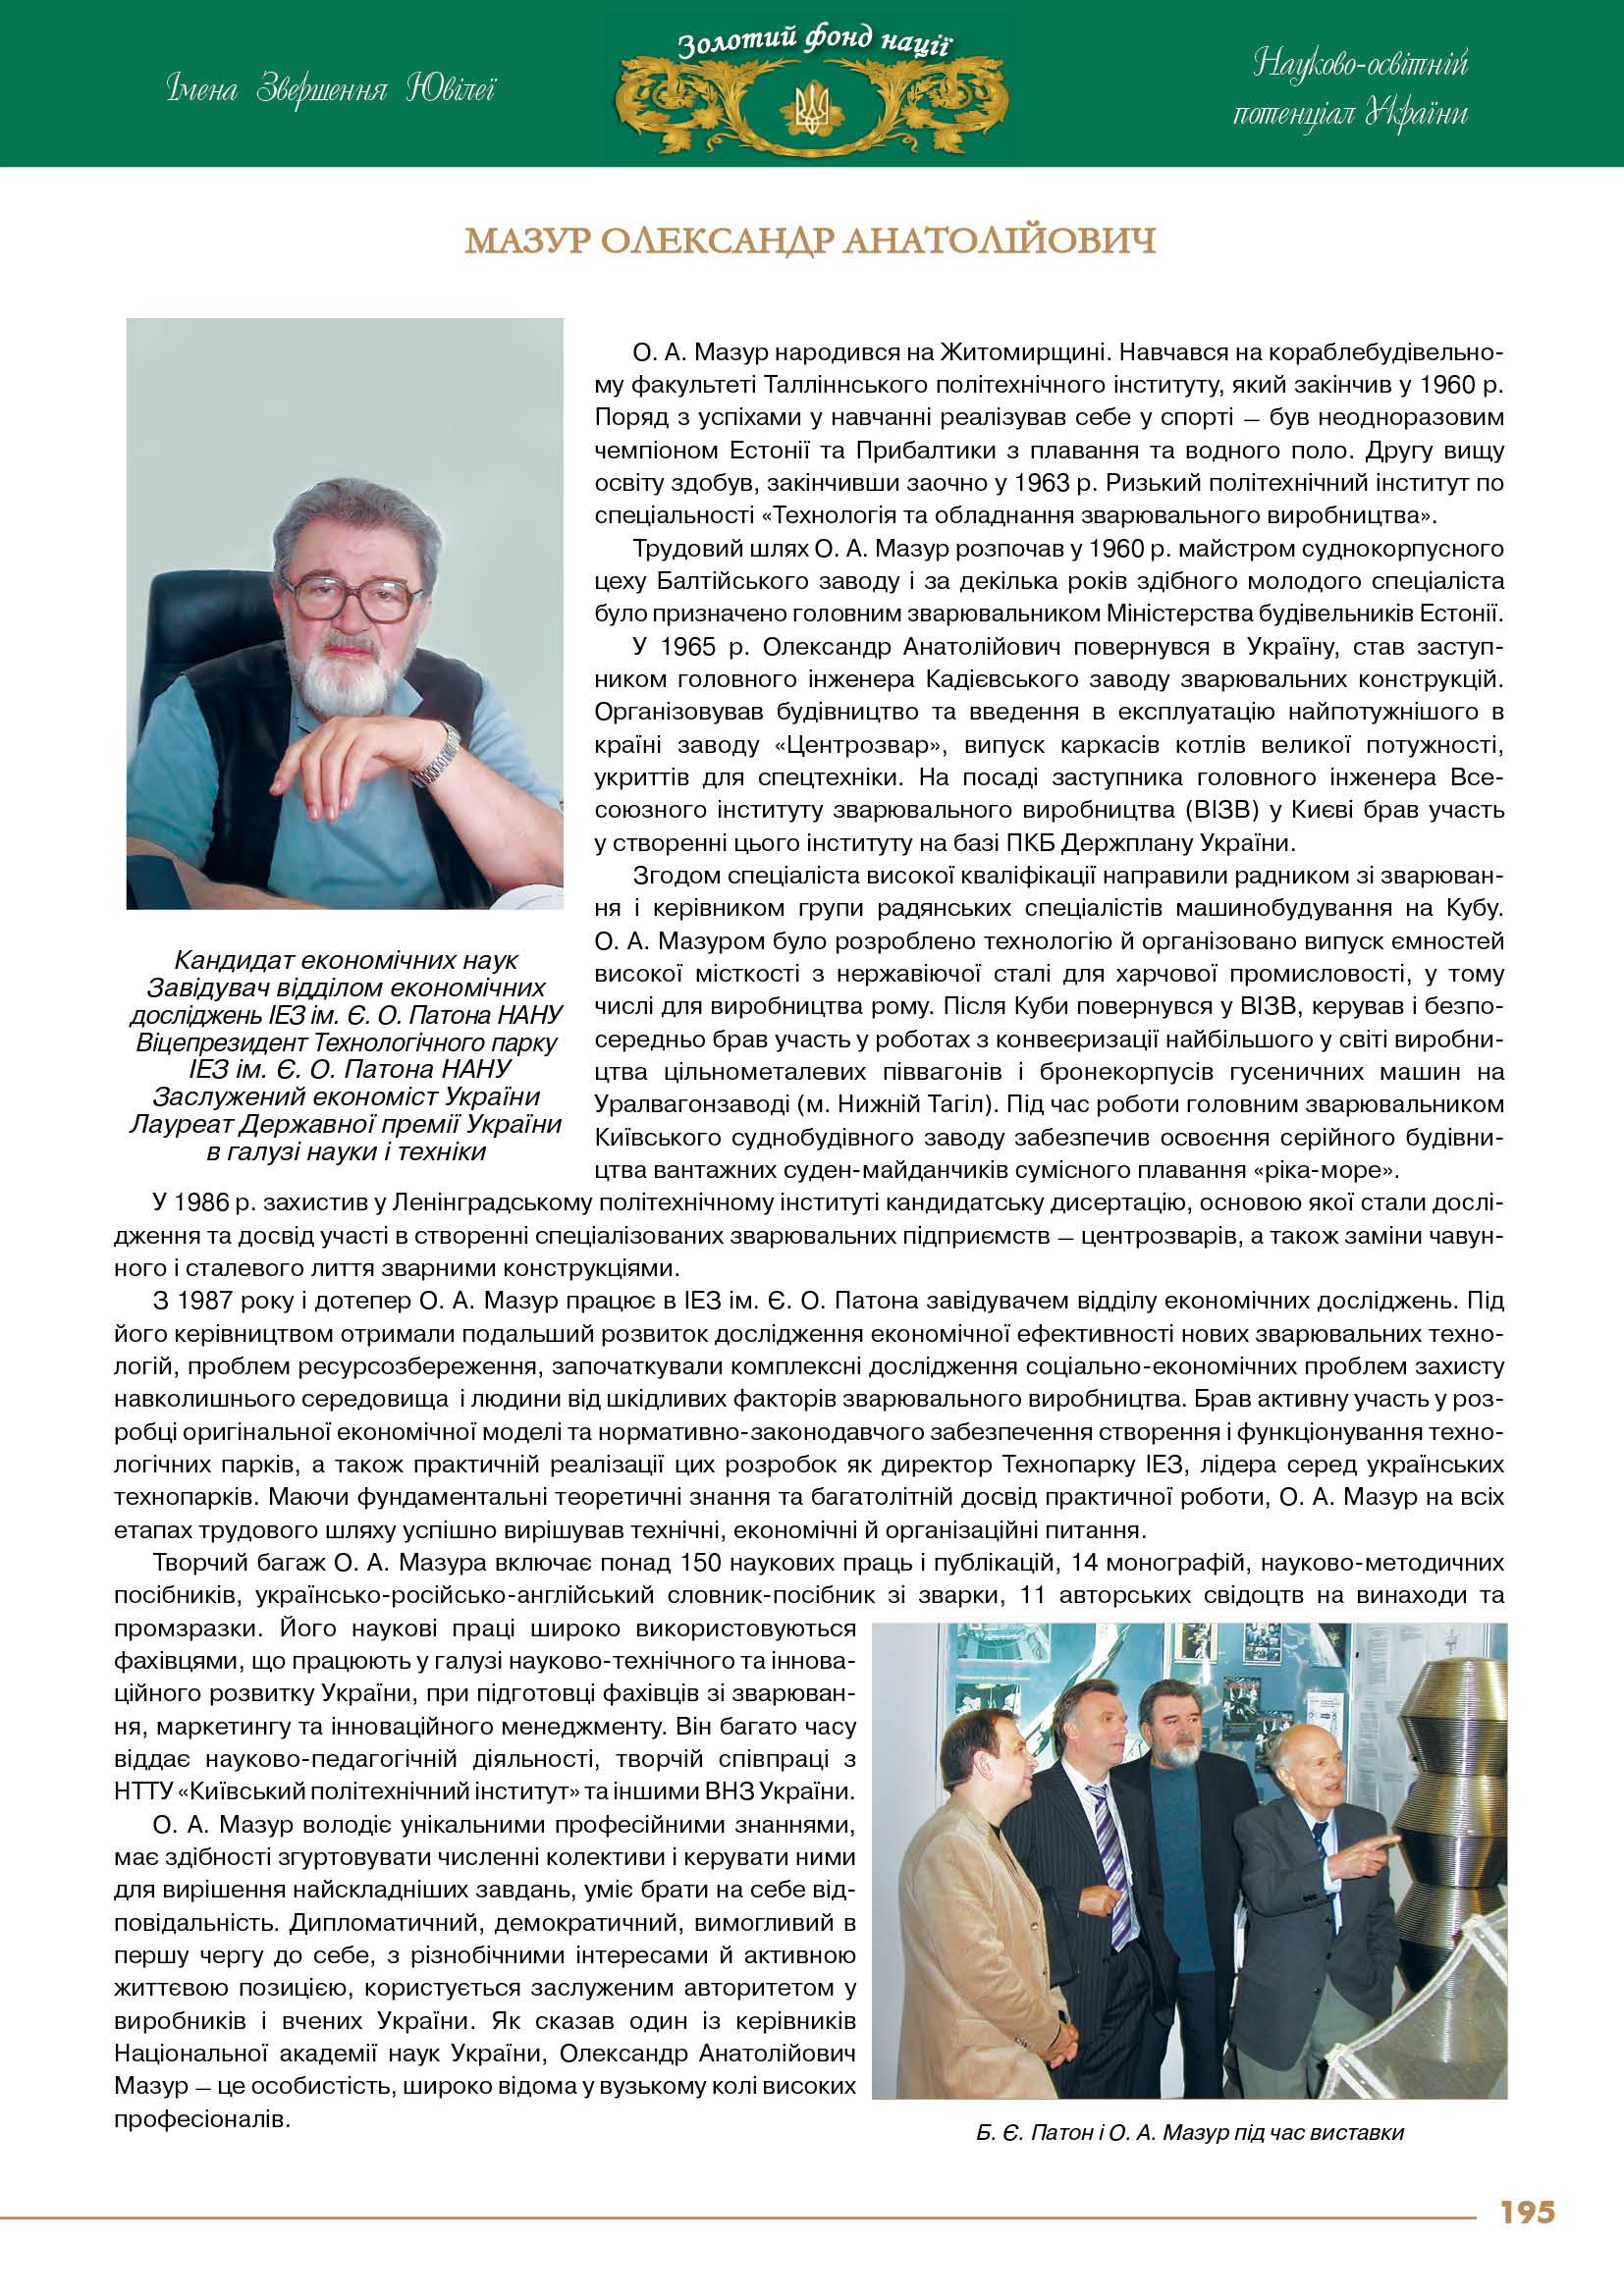 Мазур Олександр Анатолійович